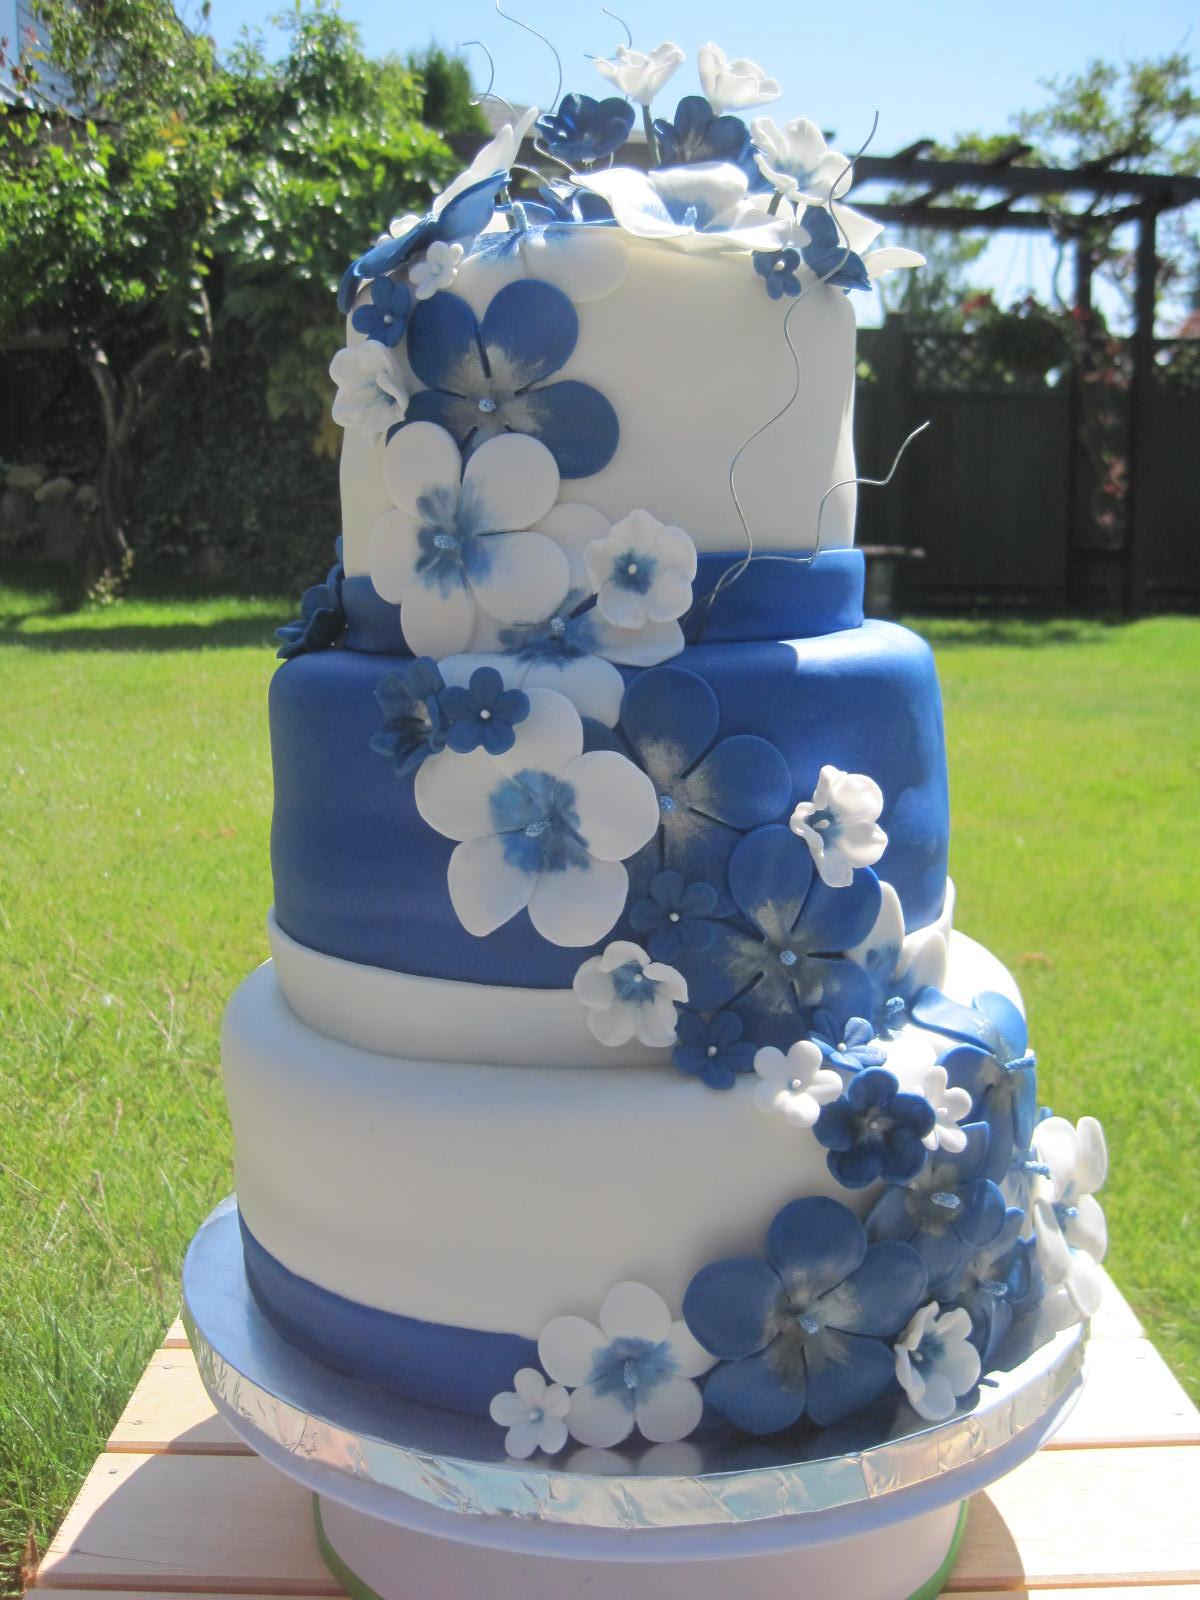 Wedding Cake Blue And White  Blue and White Wedding Cake Mikaila s Cakes